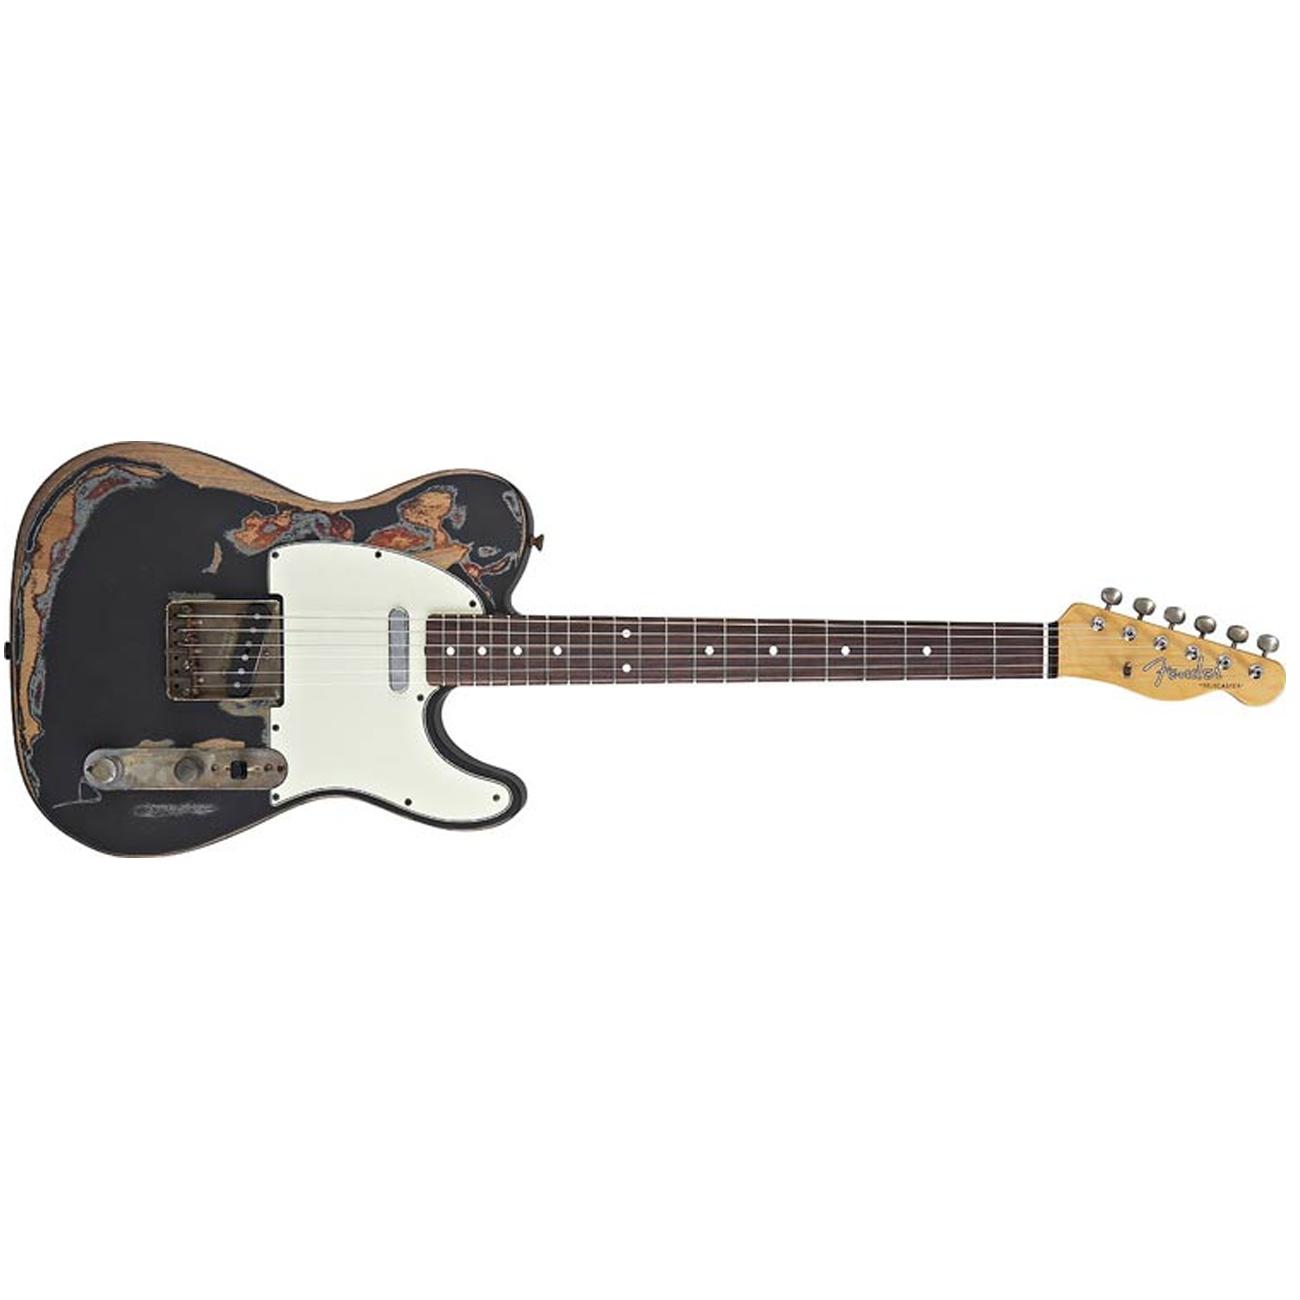 Fender Joe Strummer Telecaster สำเนา